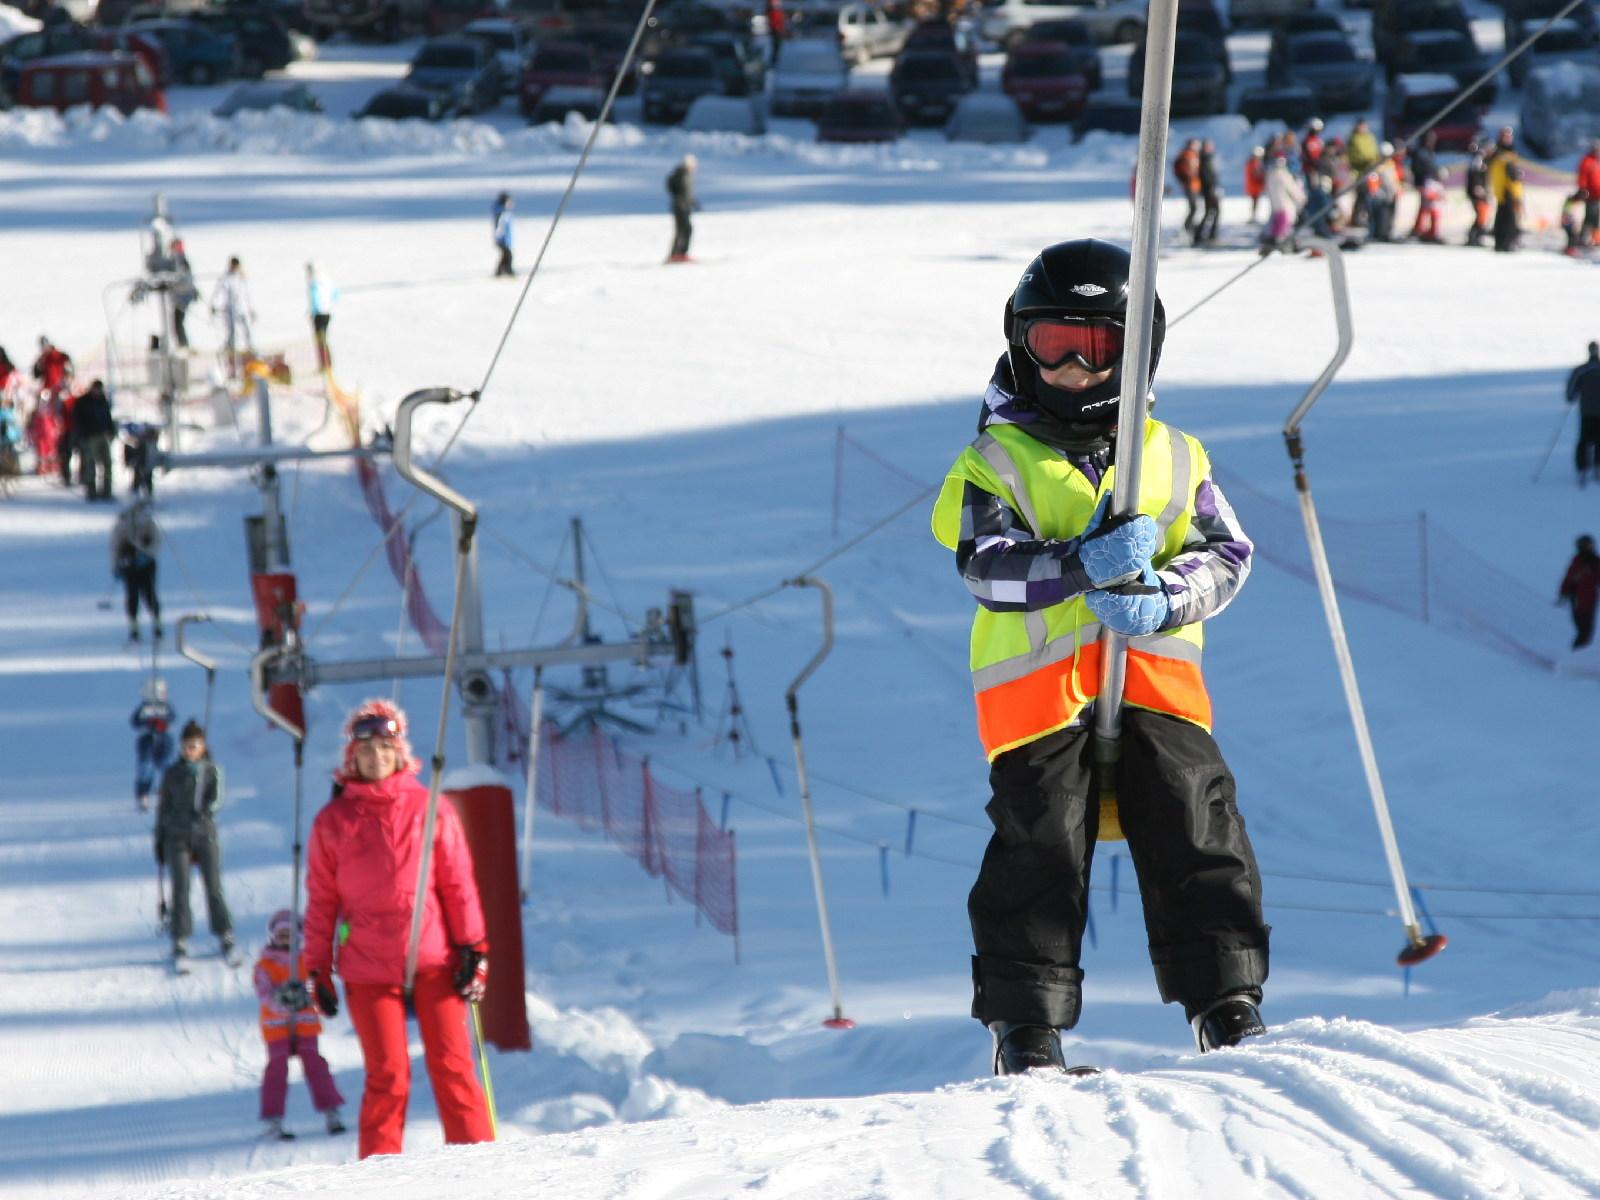 ski lift skiing snowboarding - photo #11